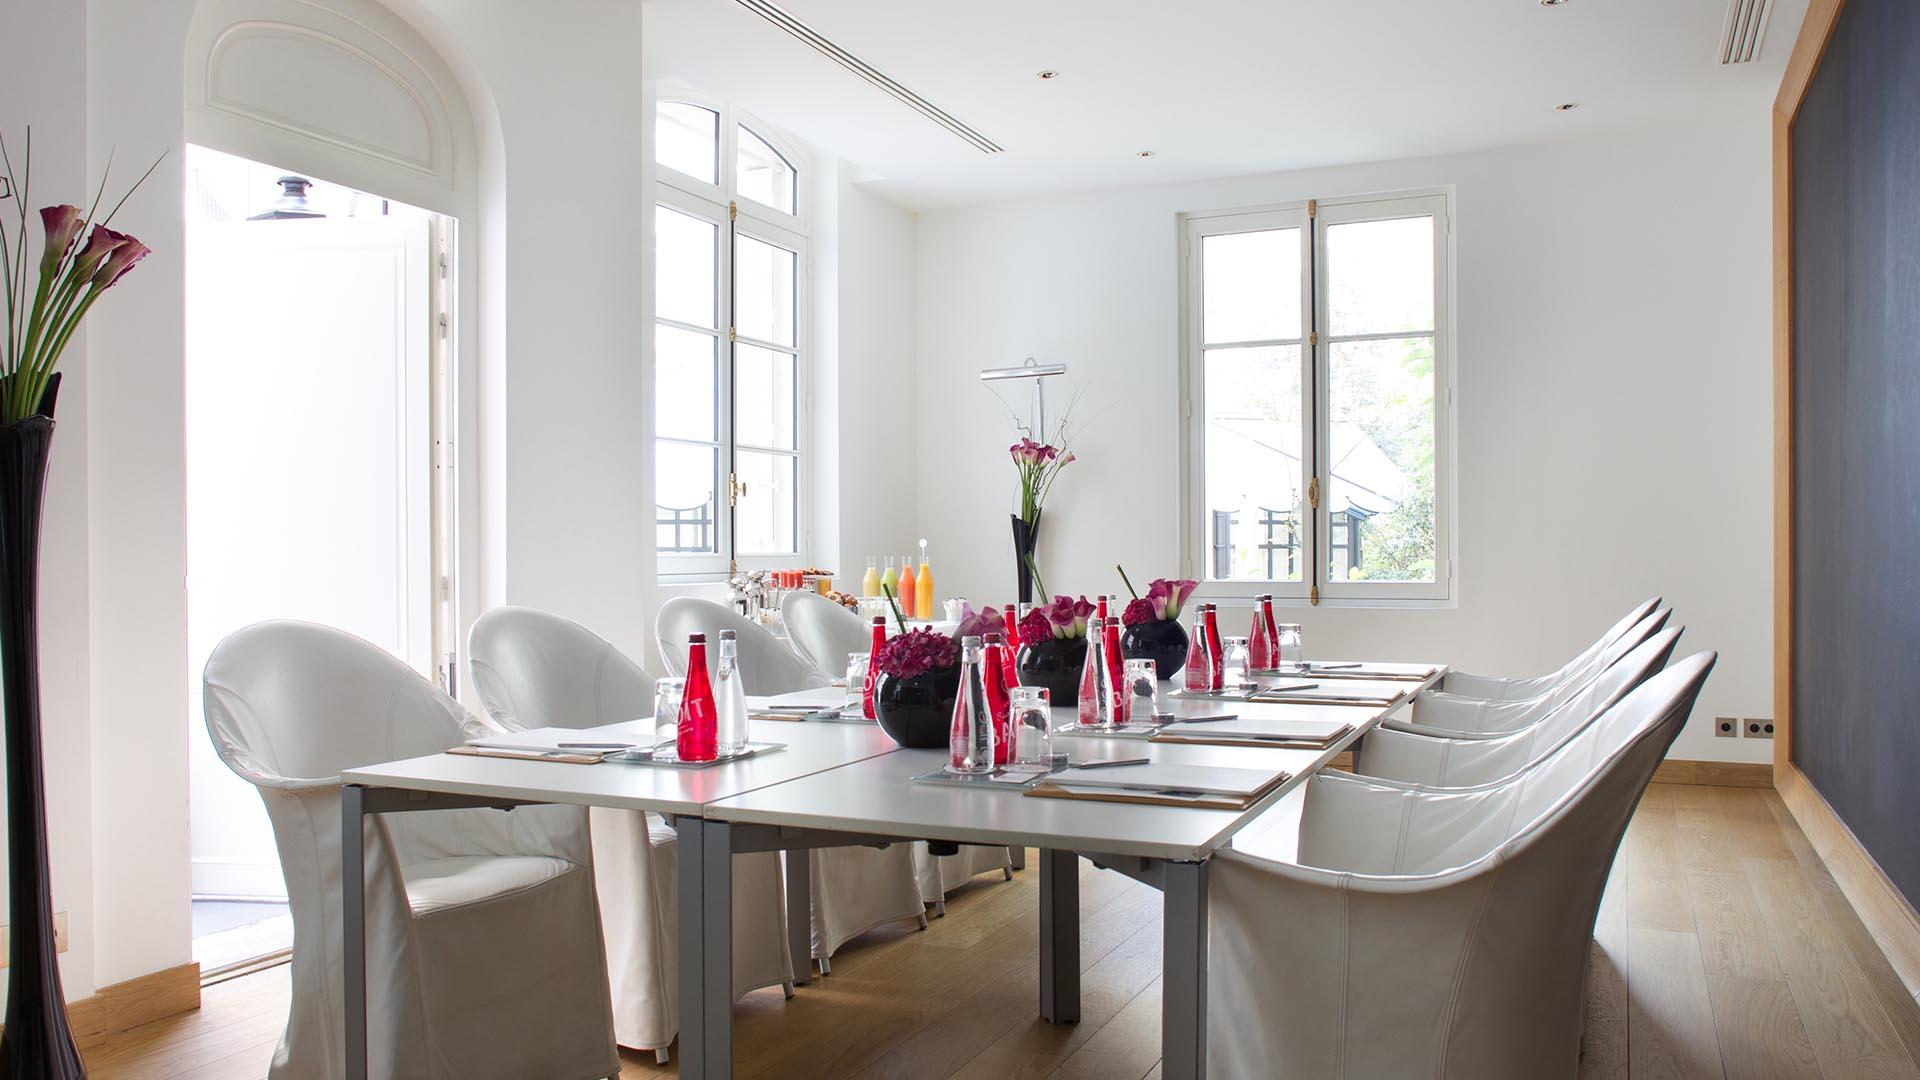 A bright, airy meeting room at Le Royal Monceau - Raffles Paris.